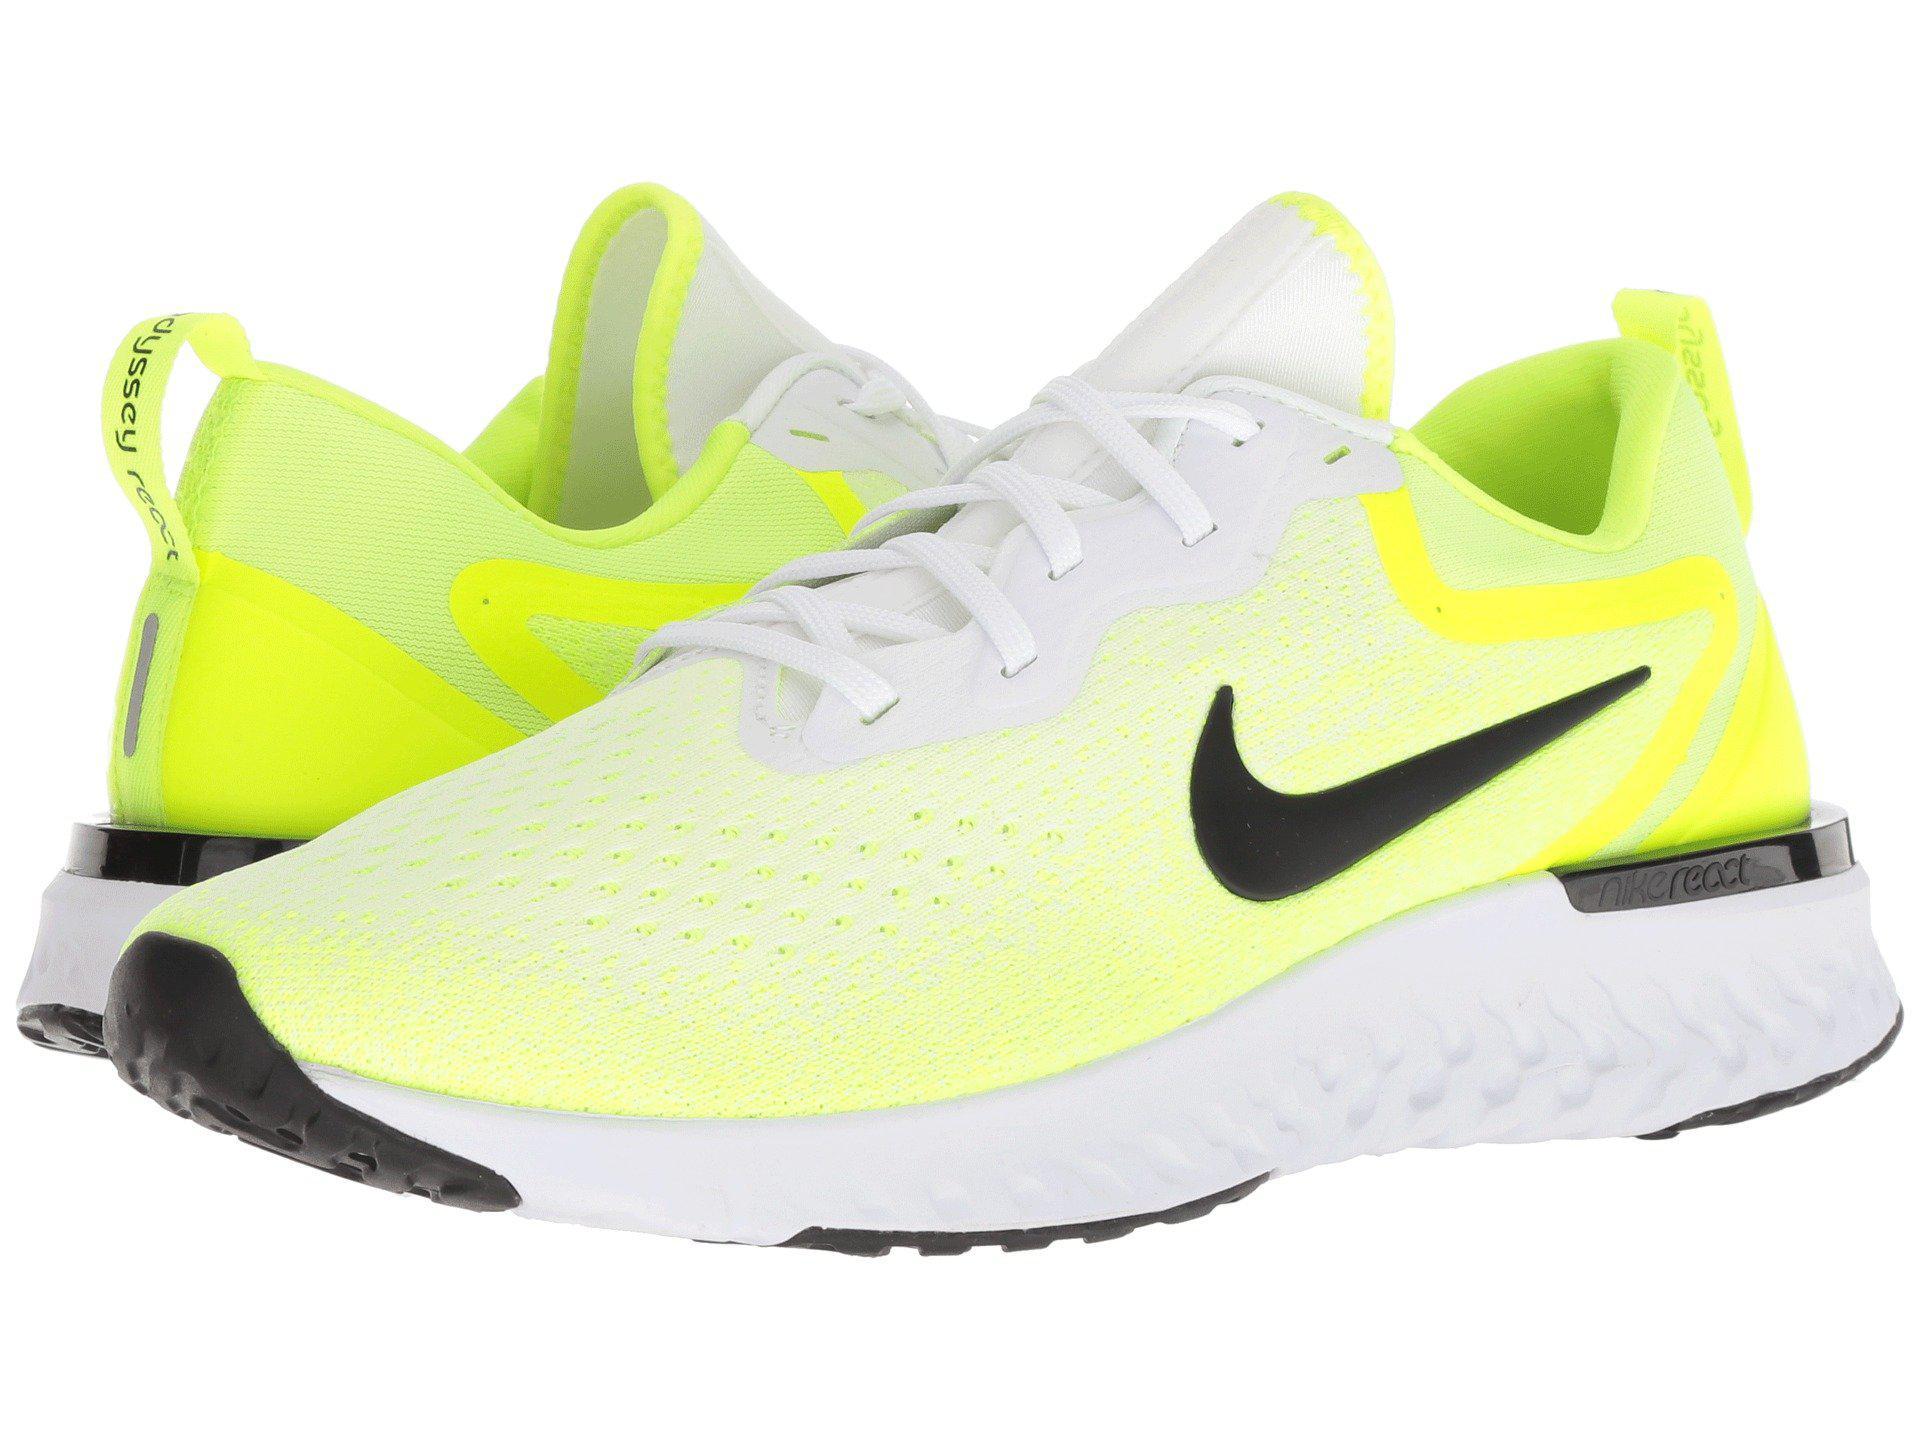 3d747a0ca Nike Odyssey React (black/metallic Pewter/thunder Grey) Men's ...